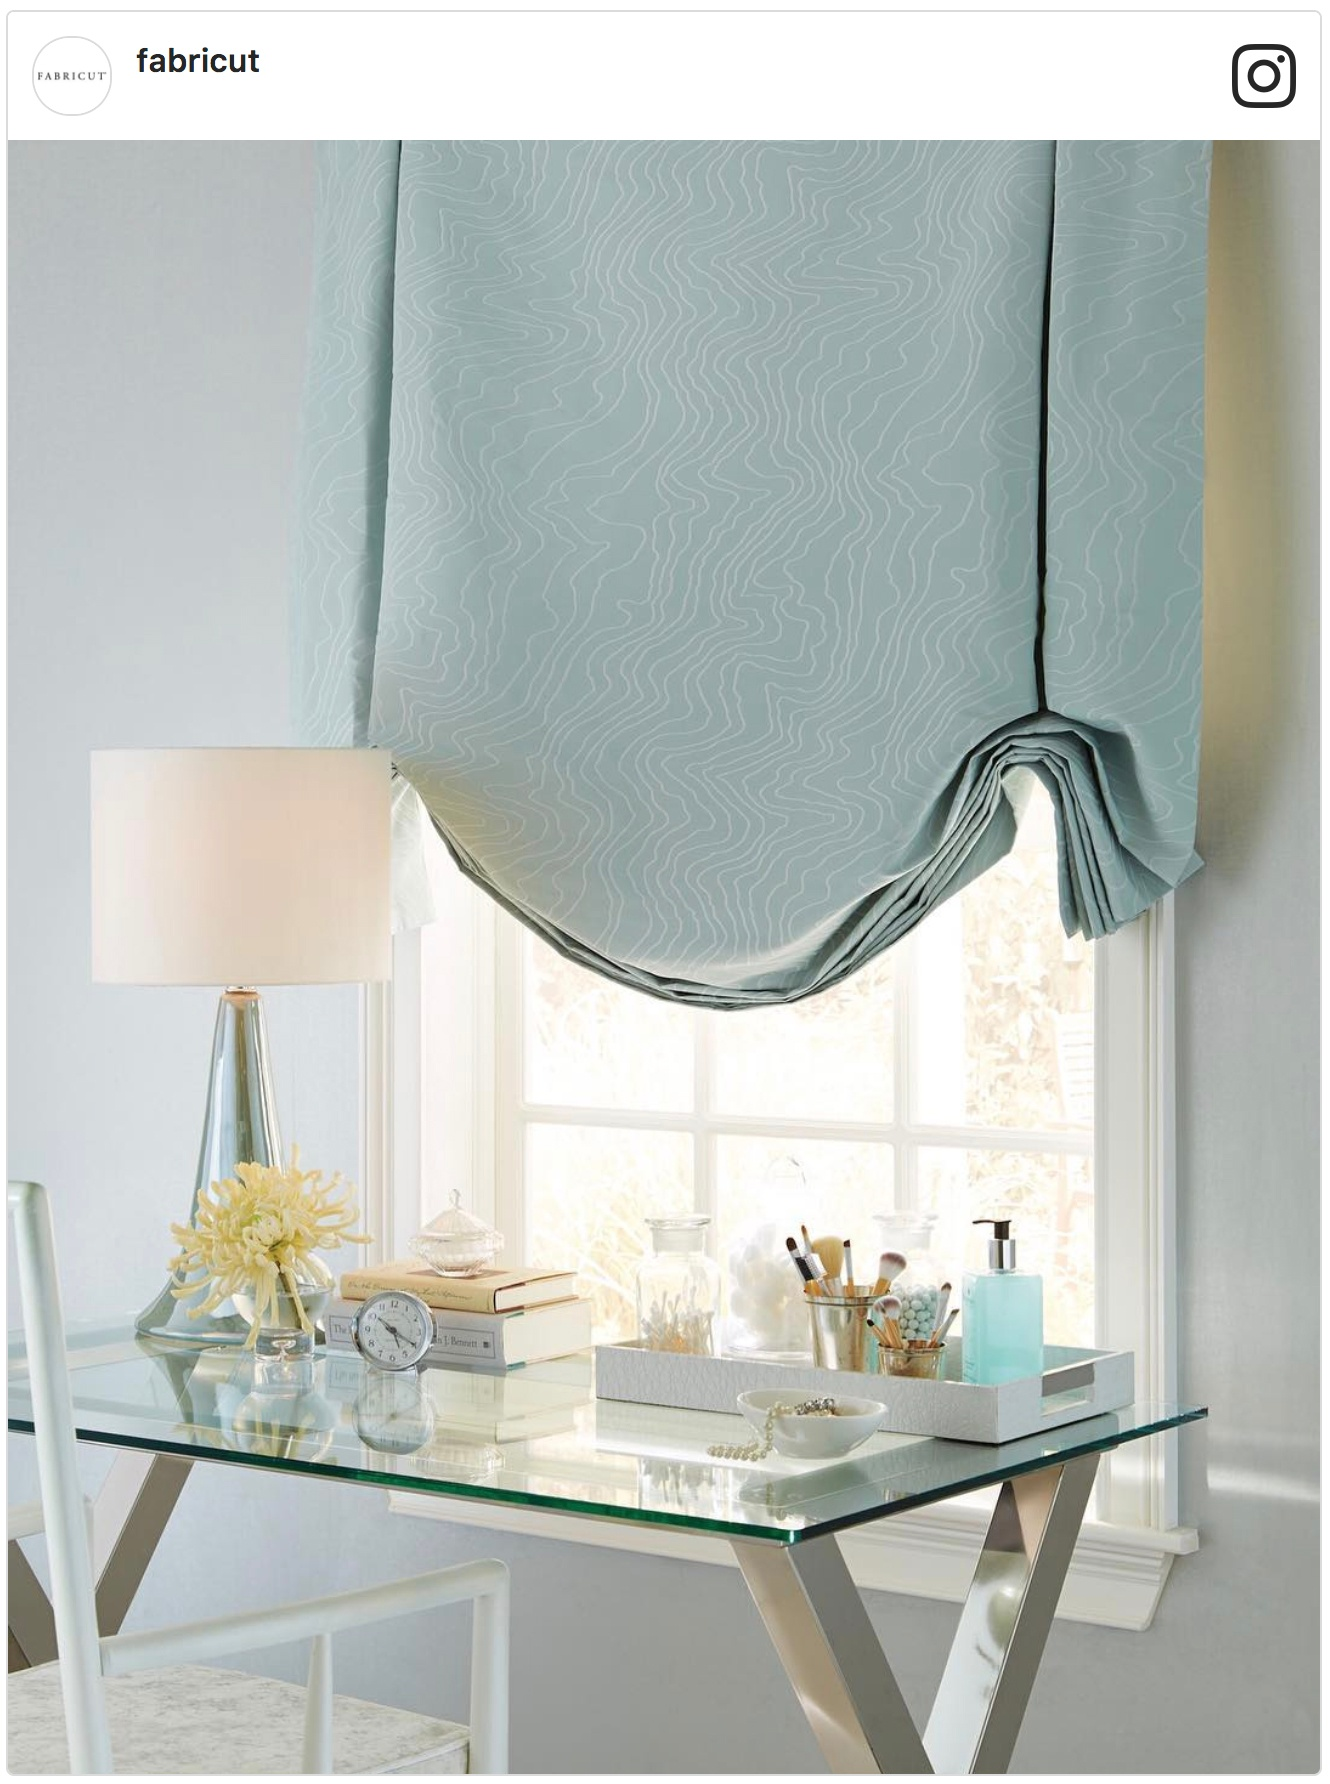 Fabricut drapery products